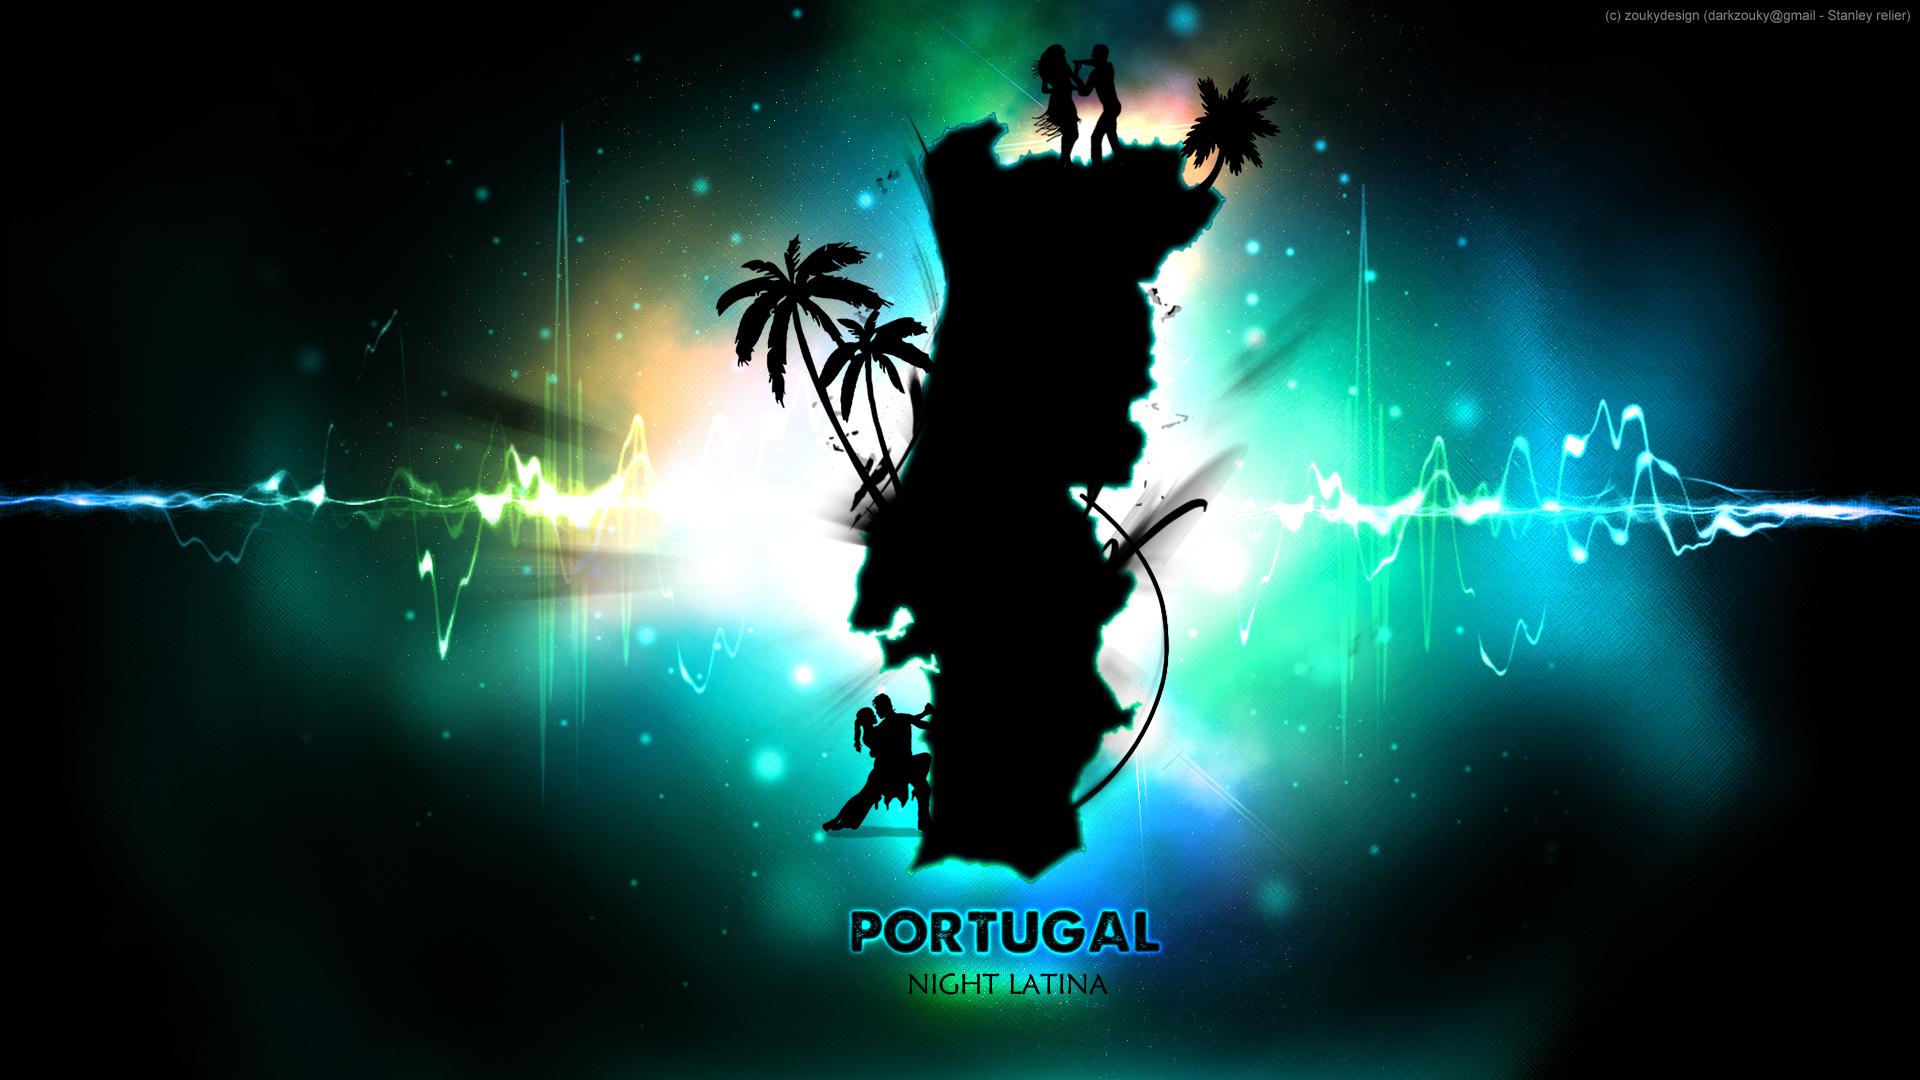 Zoukydesign for Fond ecran portugal